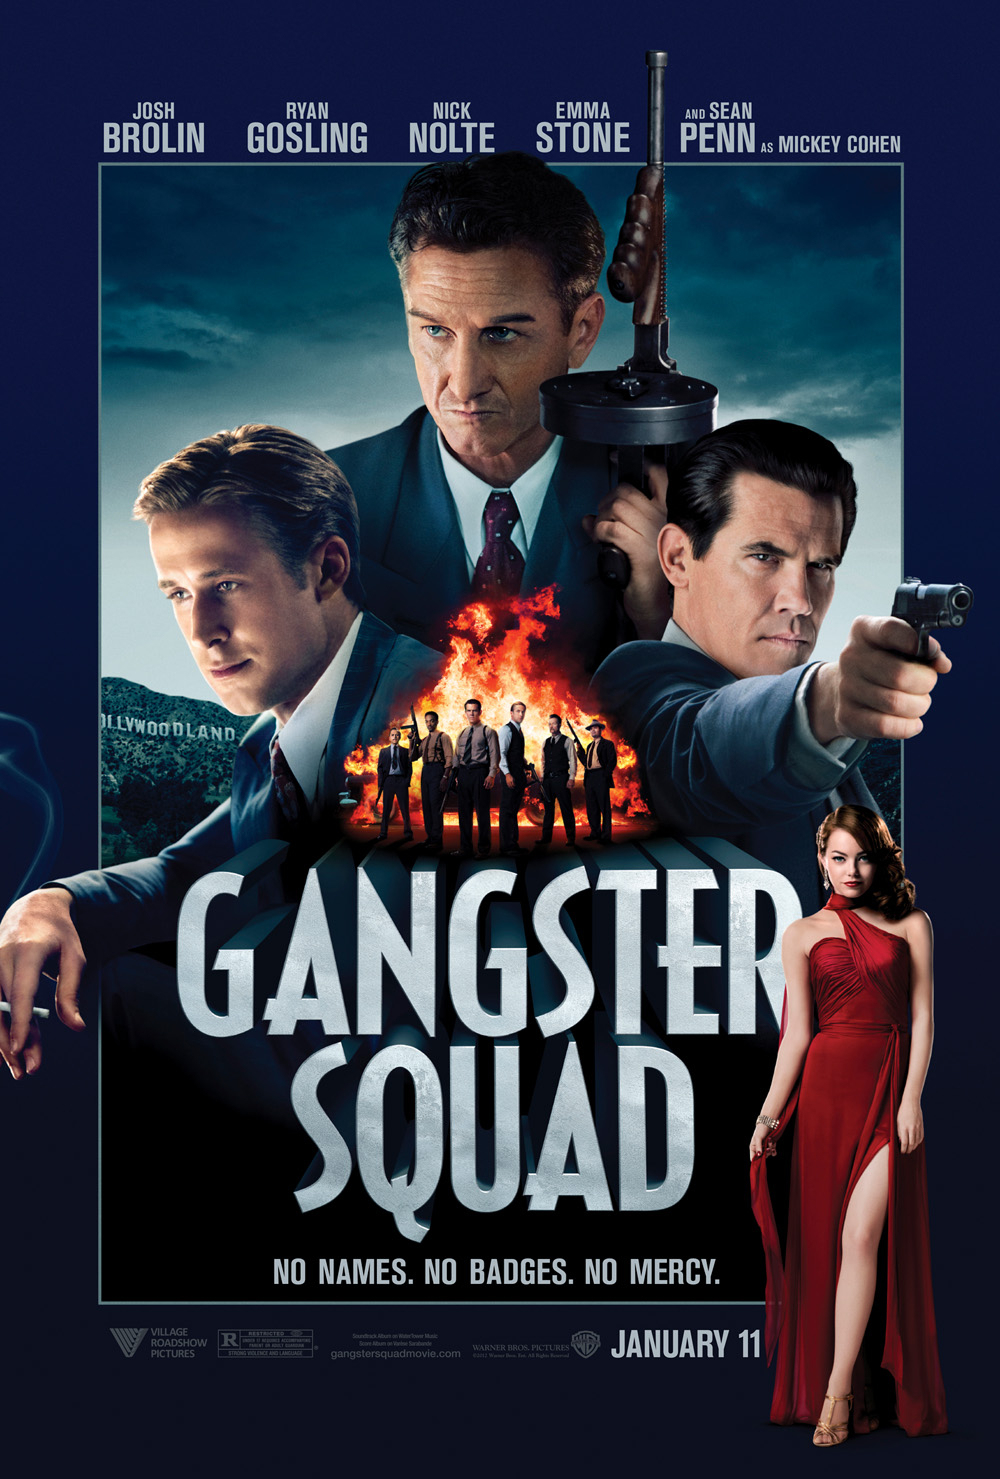 Gangster Squad - Movie Poster #1 (Original)